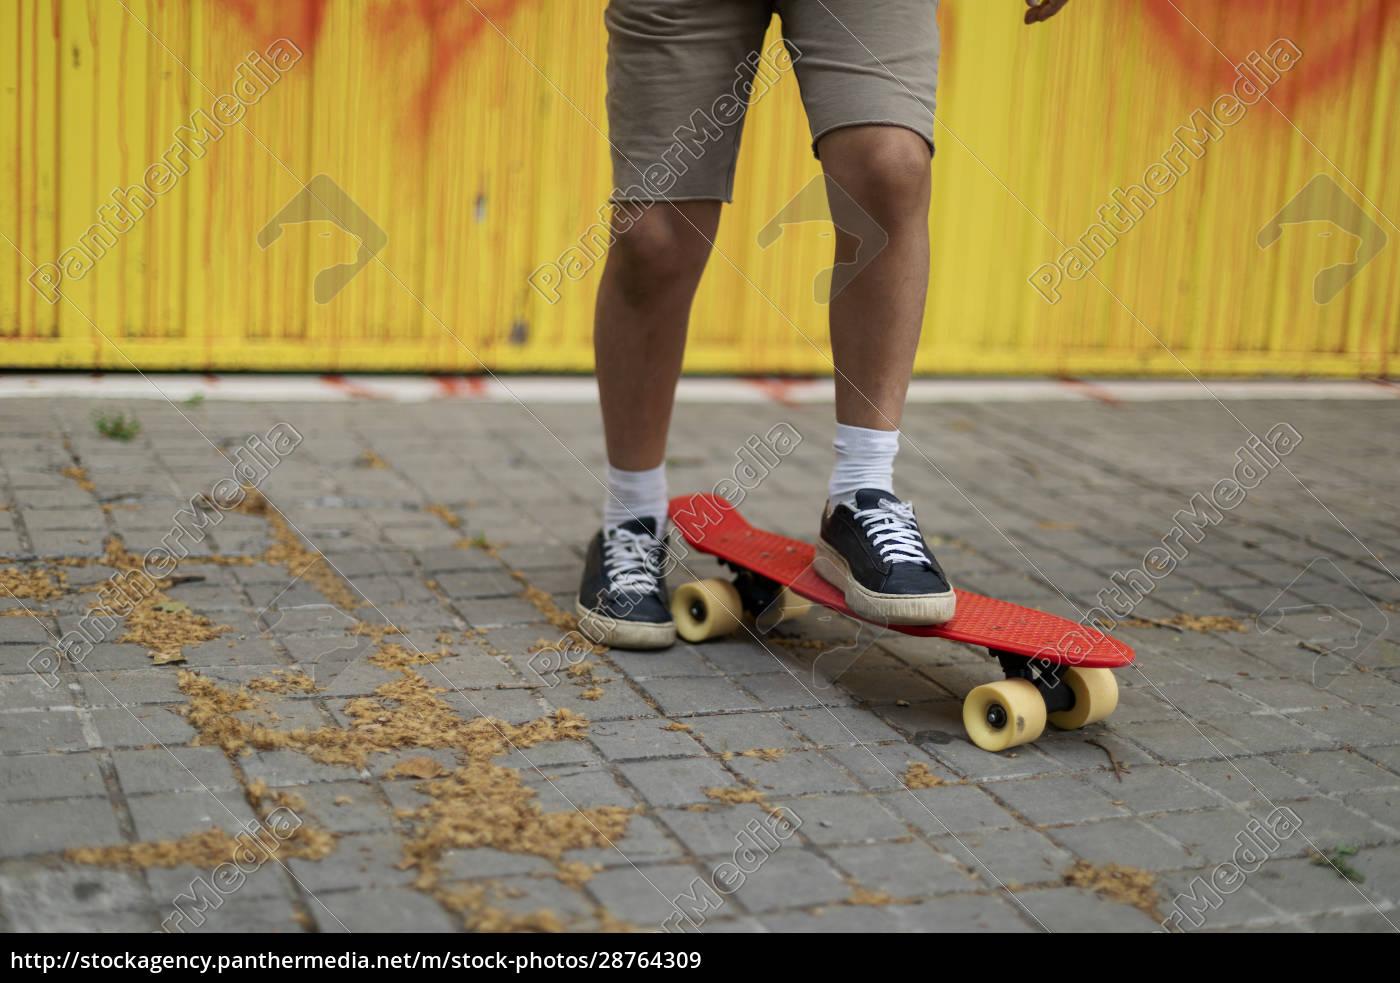 legs, of, boy, skateboarding, on, footpath - 28764309